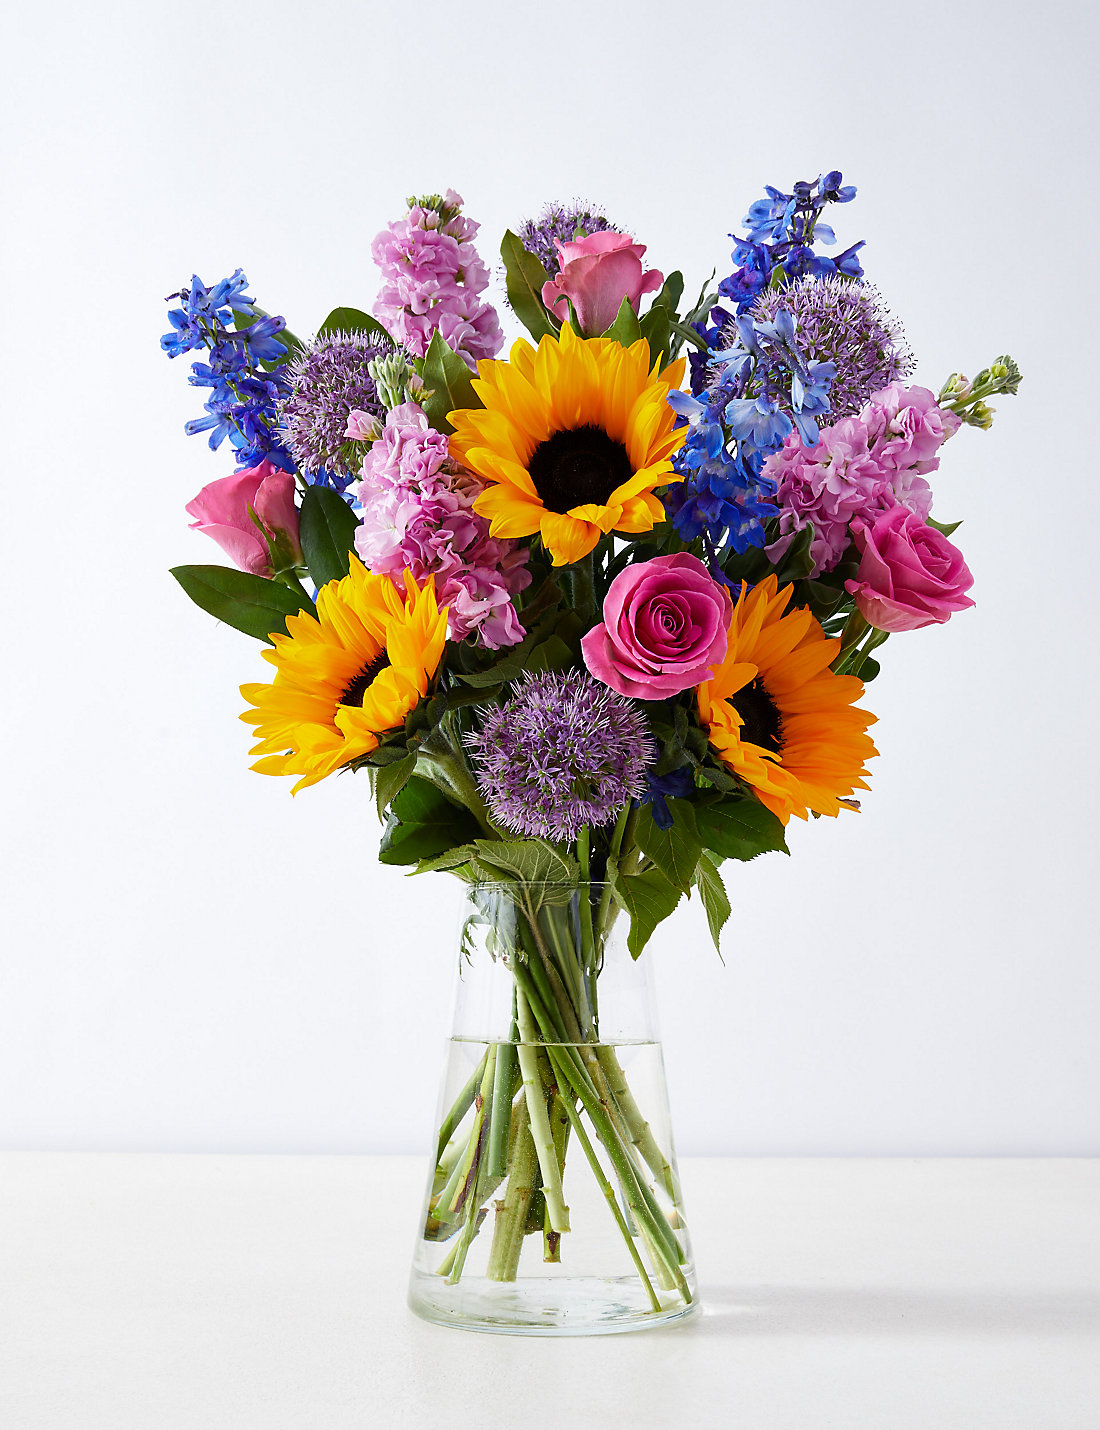 Rhs chelsea flower show soleil bouquet ms rhs chelsea flower show soleil bouquet dhlflorist Gallery